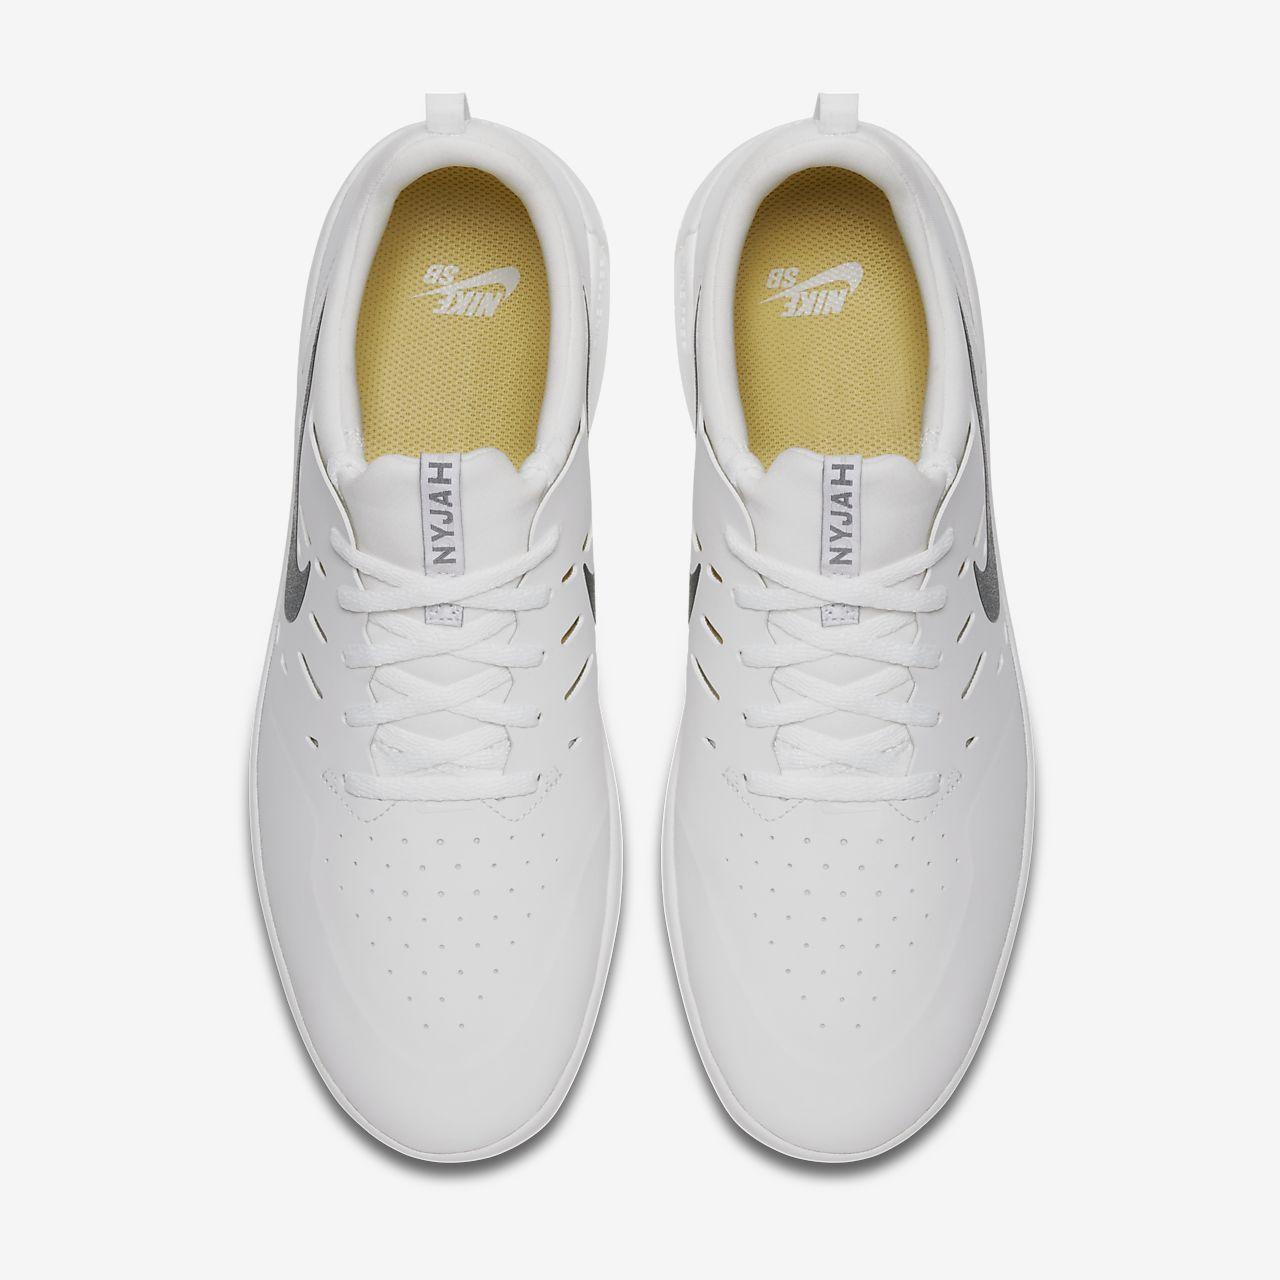 639b91a1f19438 Nike SB Nyjah Free Skate Shoe. Nike.com